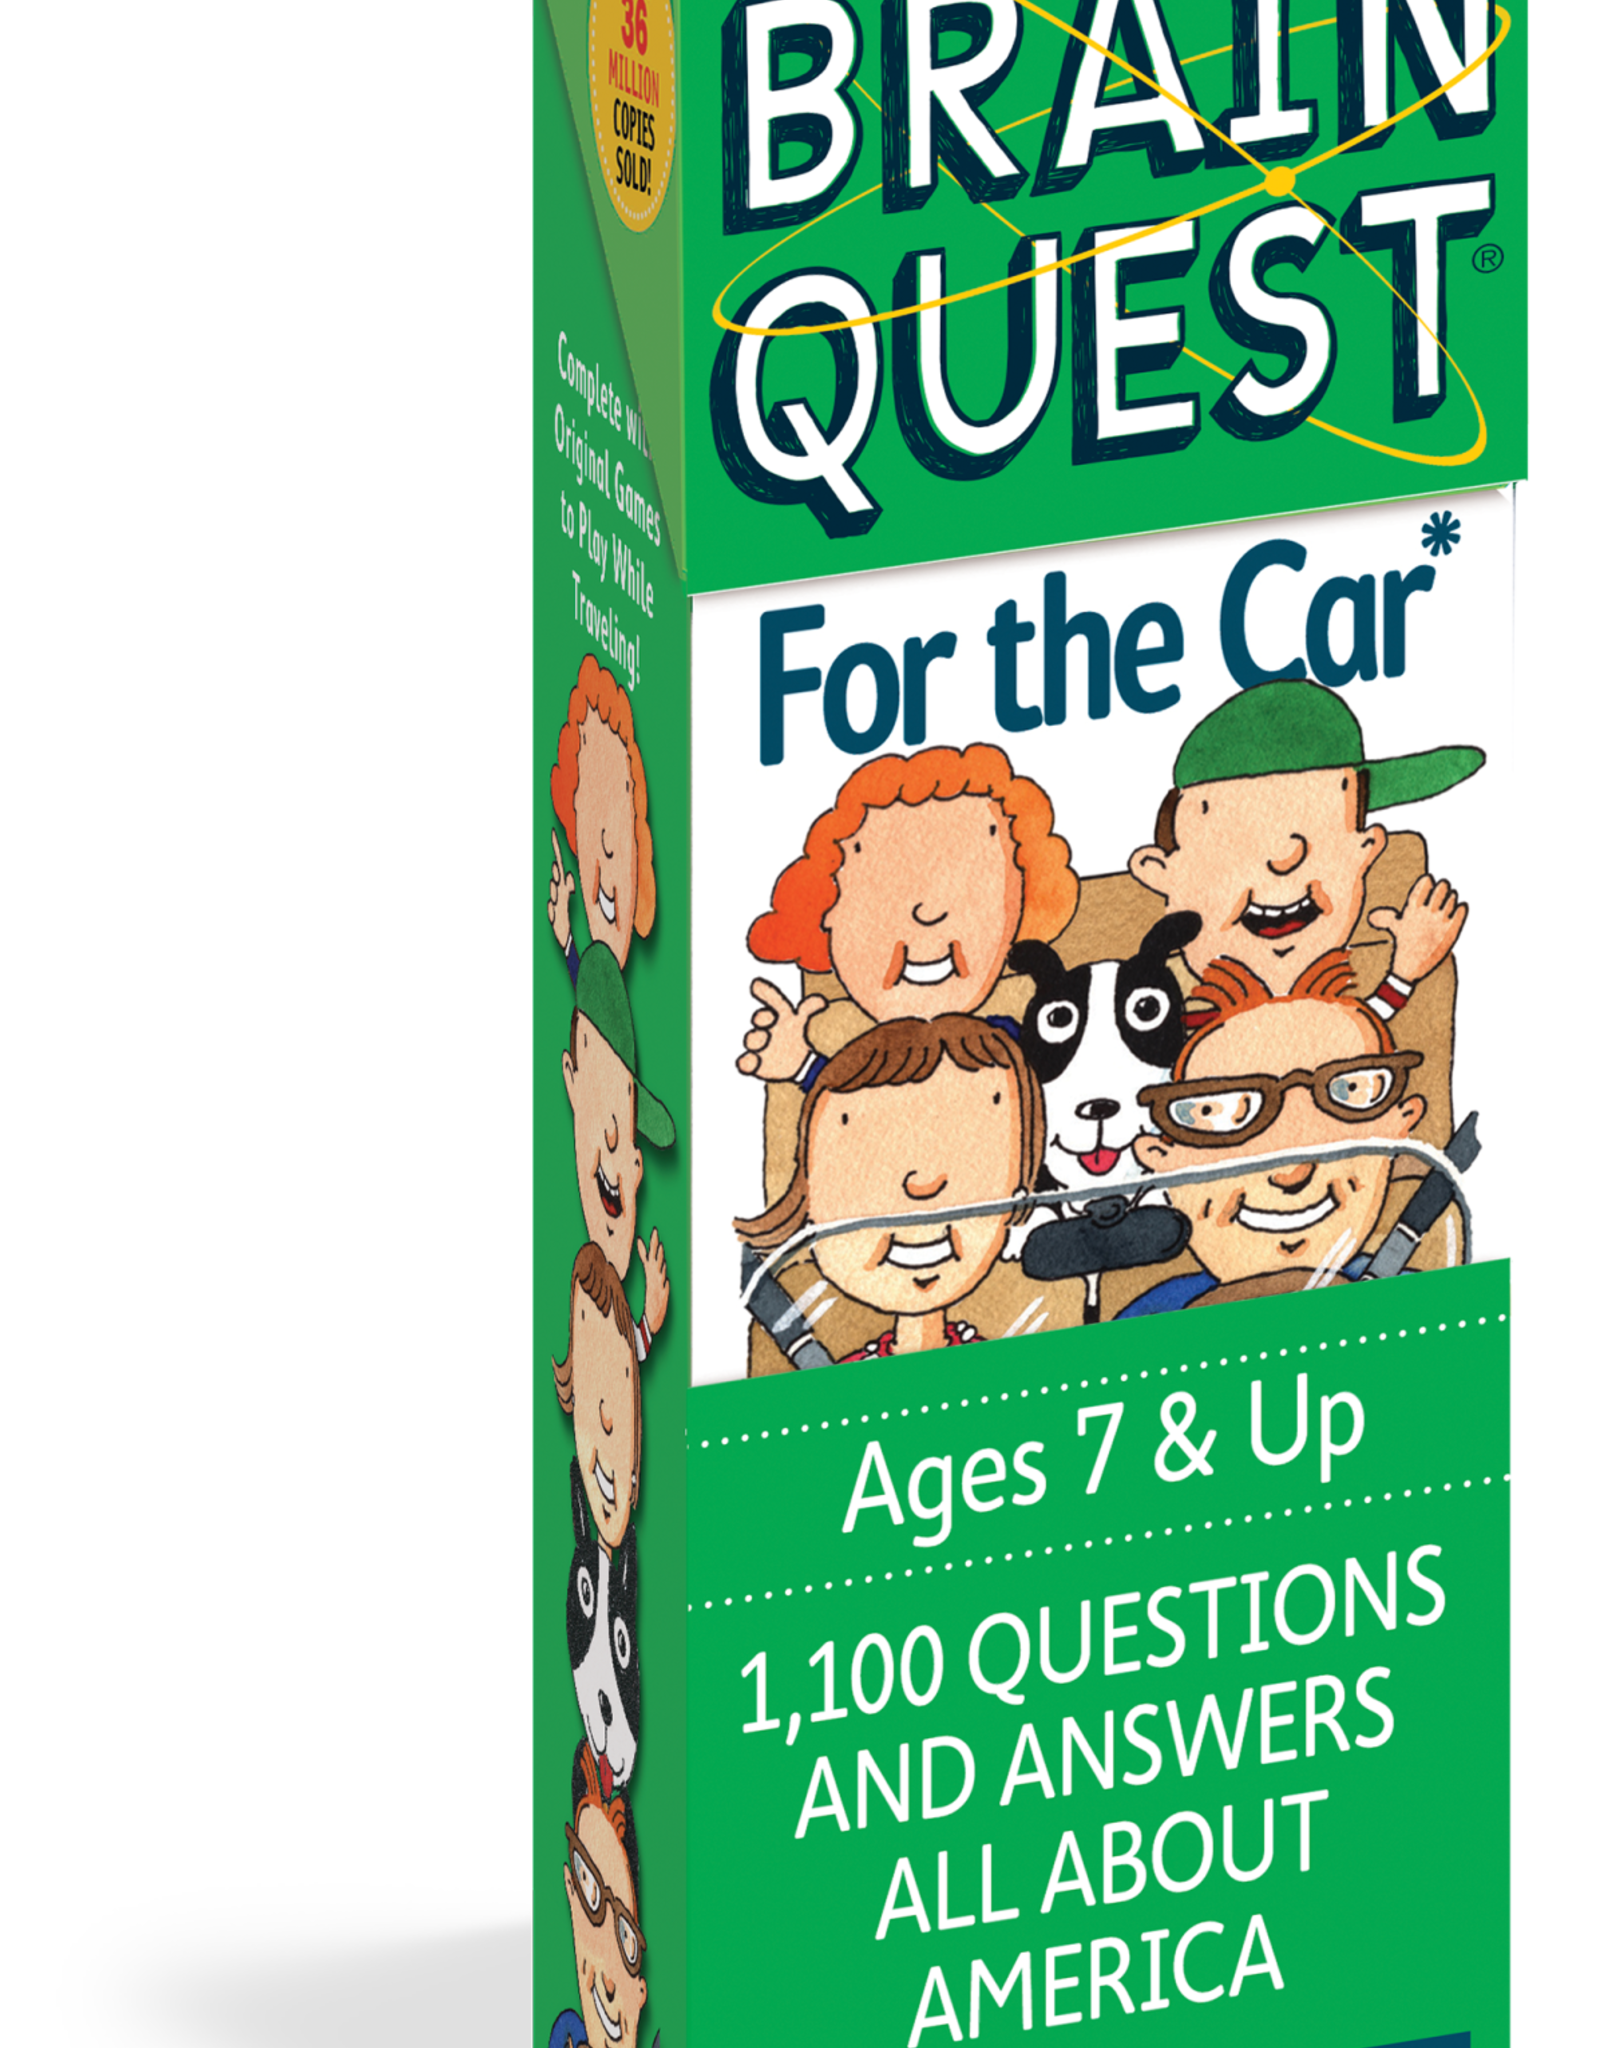 Workman Brain Quest For the Car